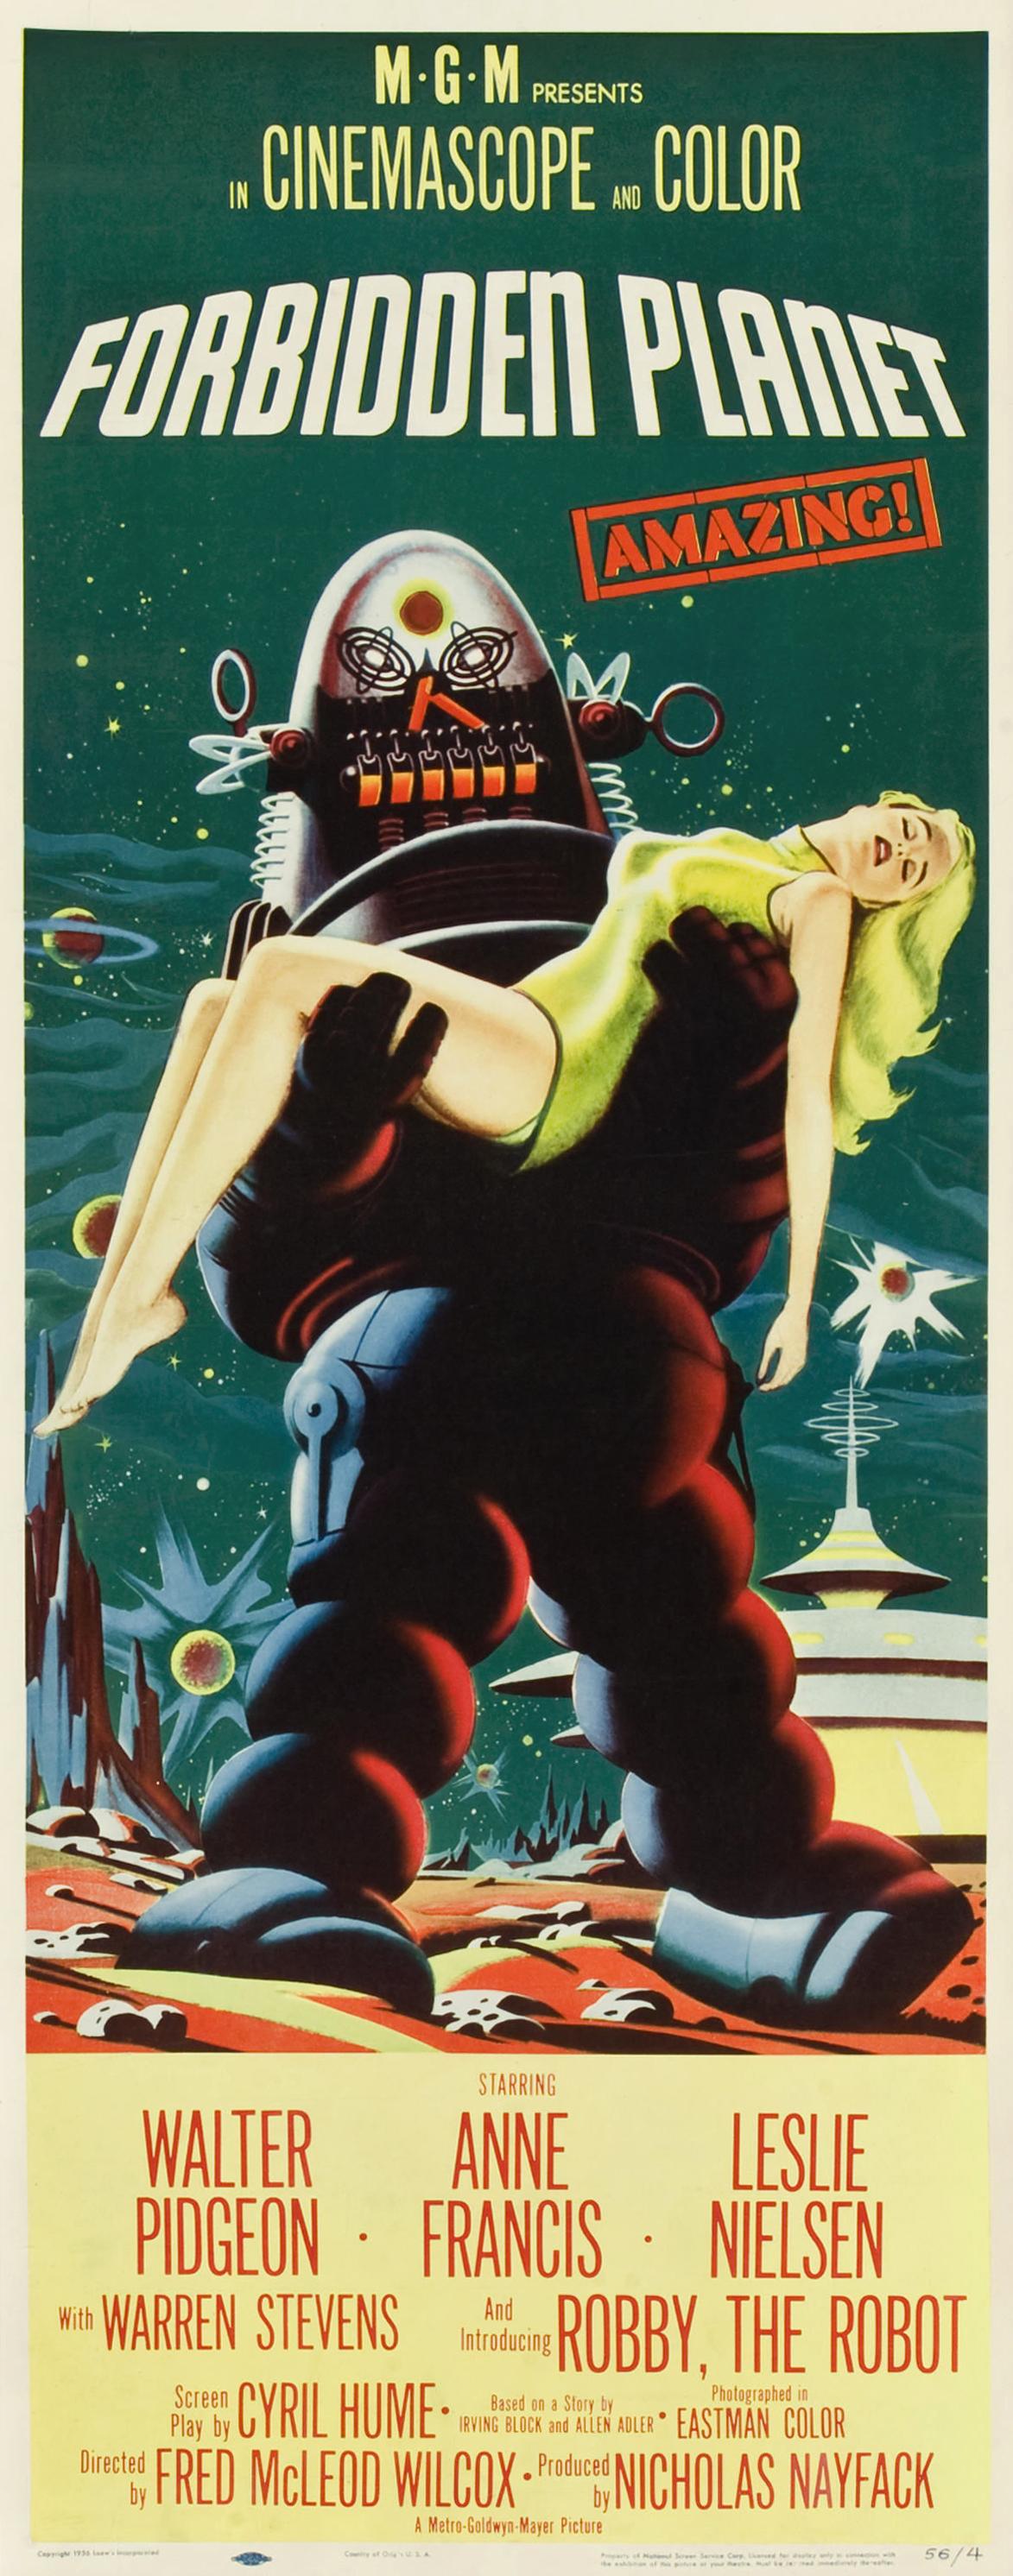 Forbidden Planet Forbidden Planet 1956 Poster